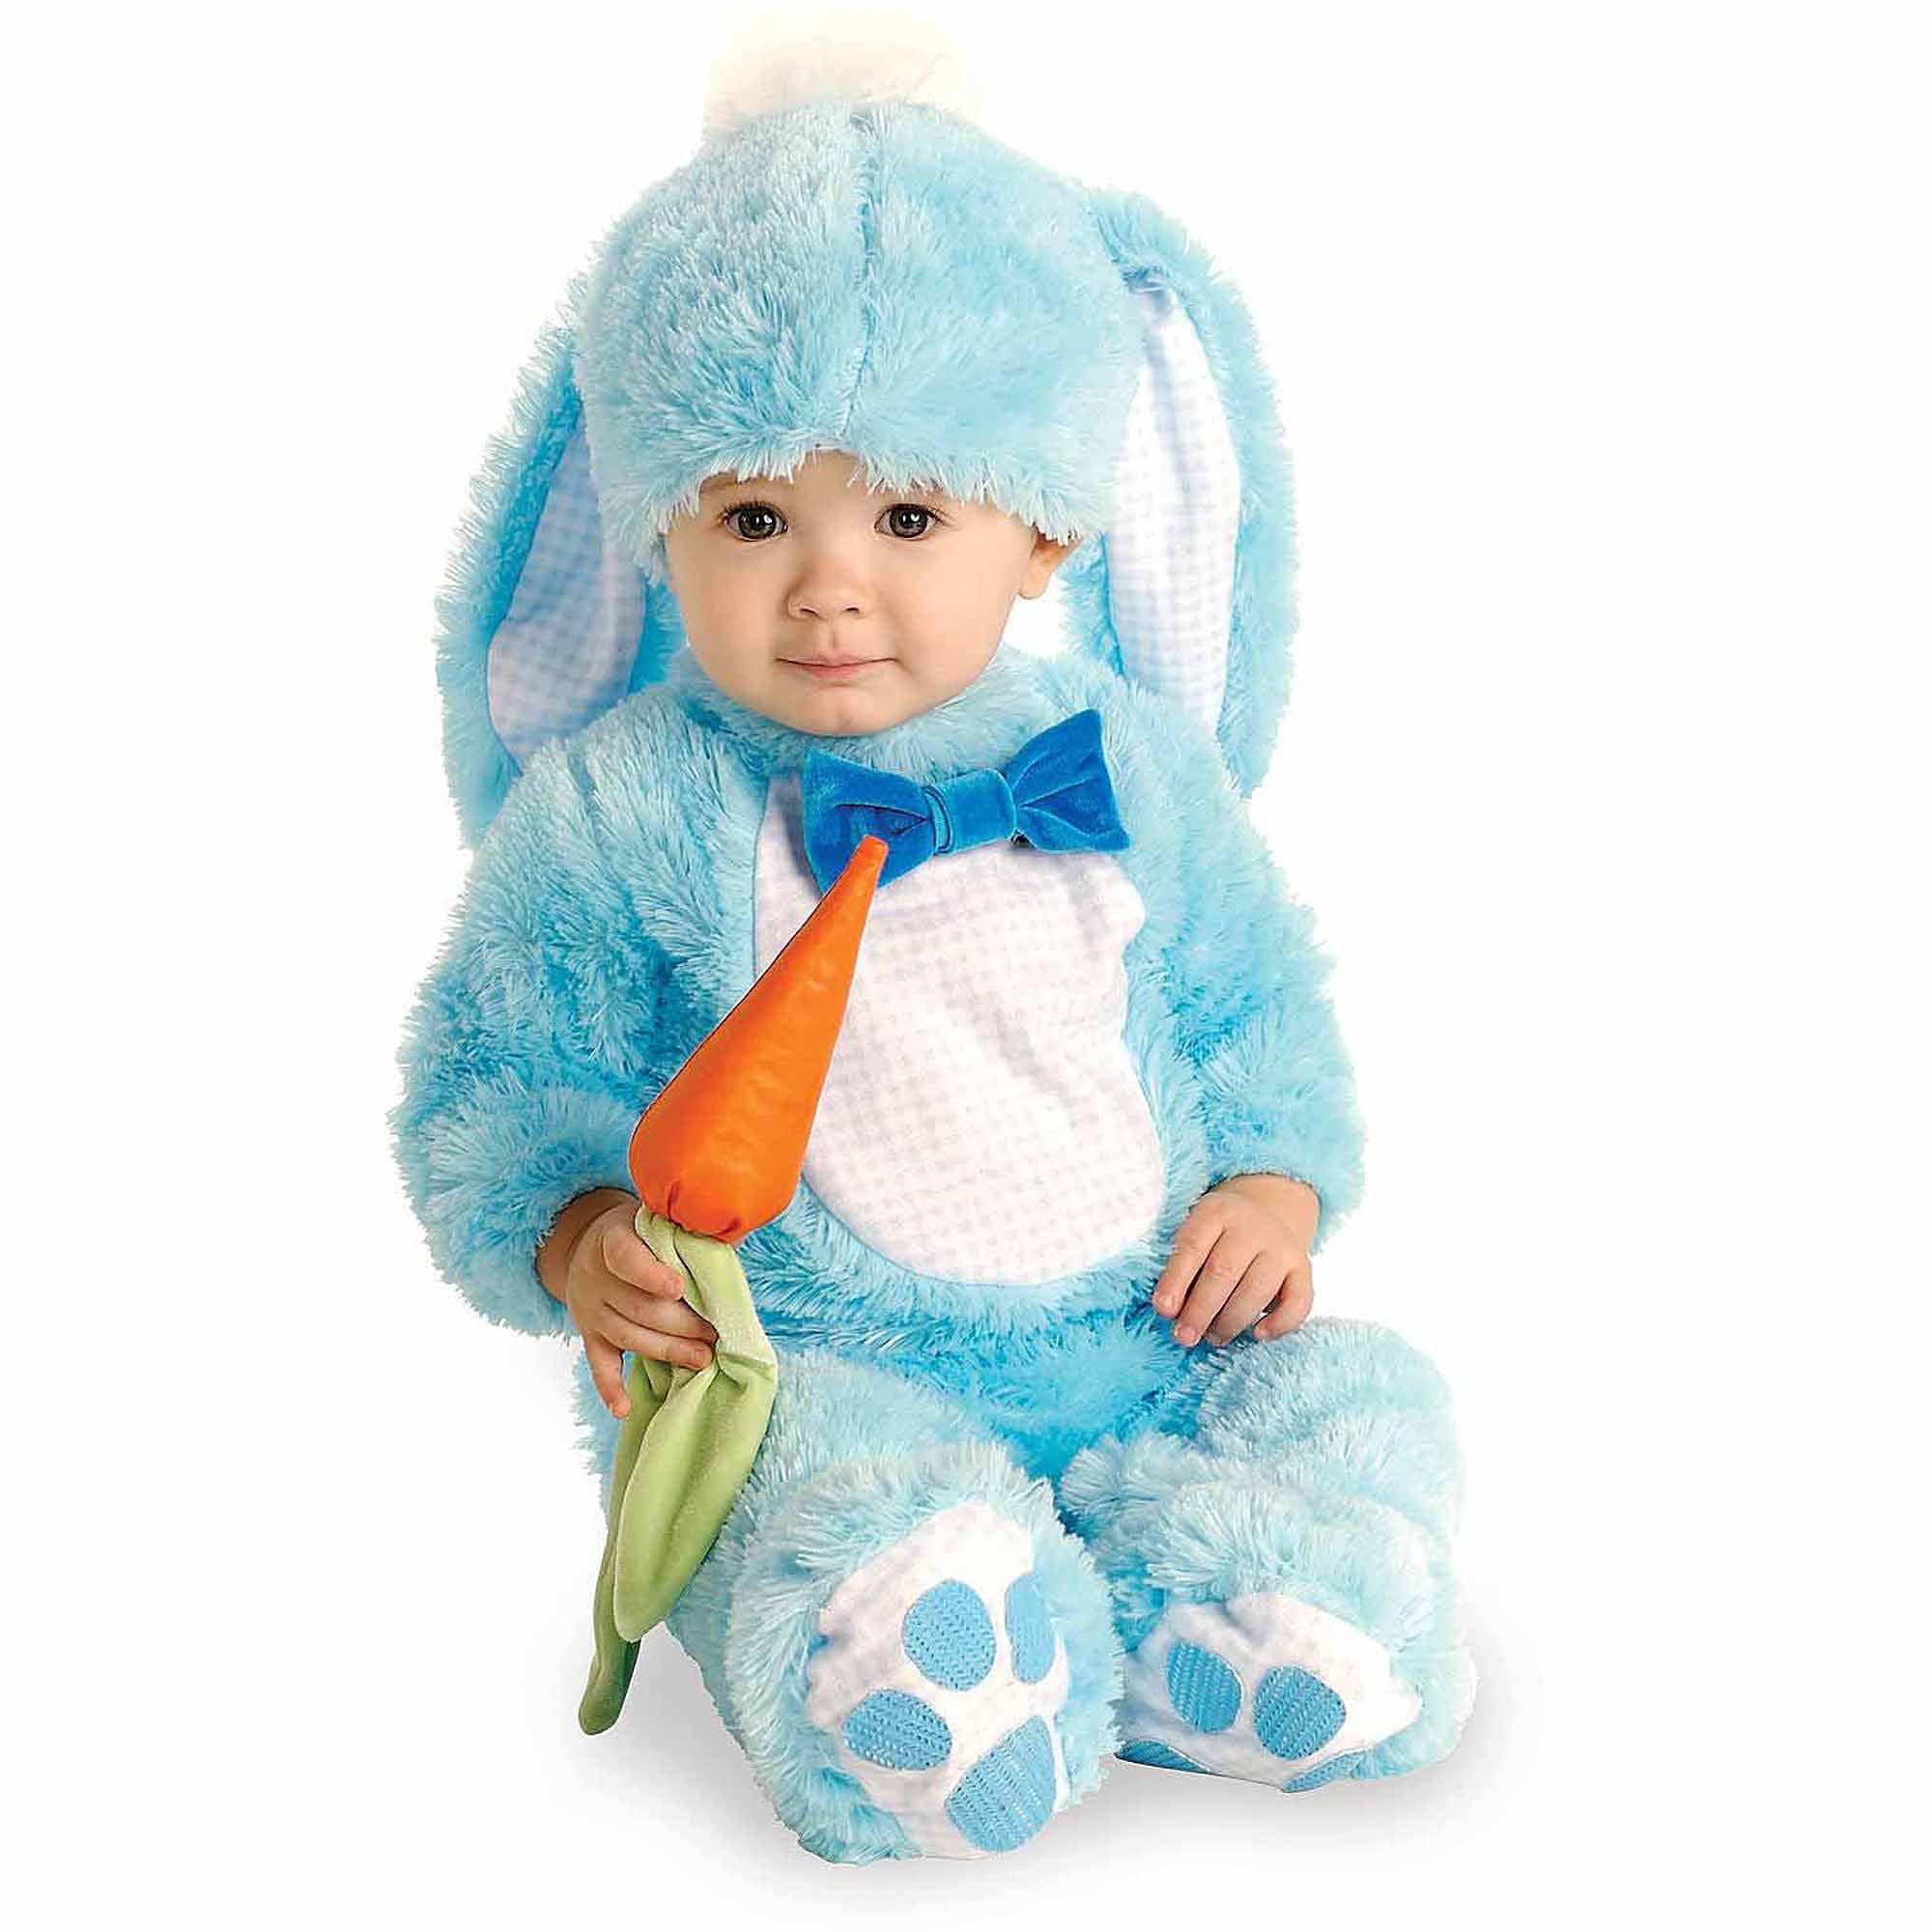 Blue Bunny Infant Halloween Costume